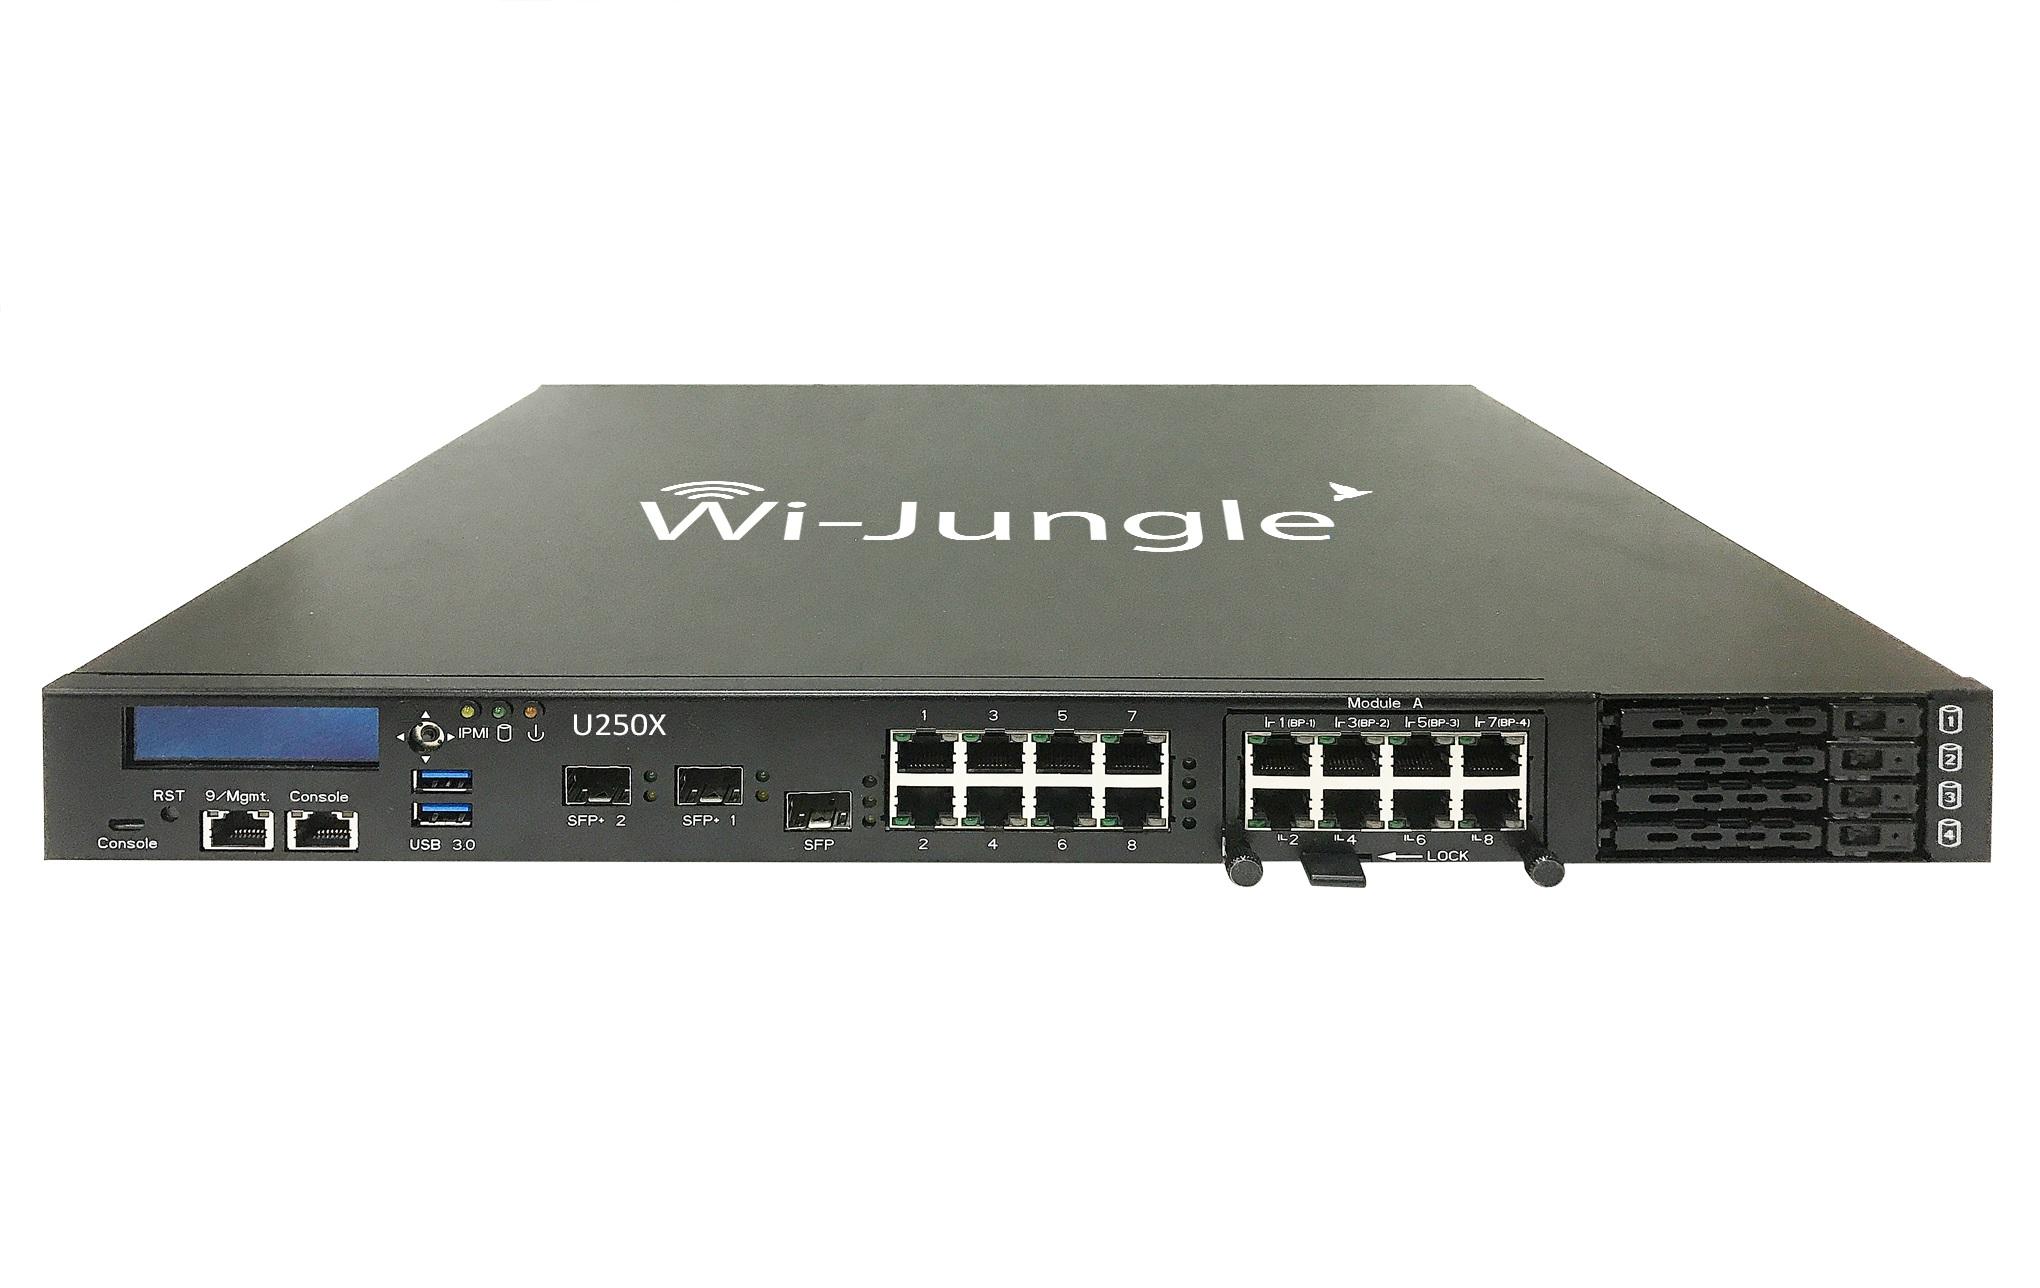 WiJungle U250X (NextGen Firewall/UTM + Web Application Firewall + Hotspot Gateway + Load Balancer Router + VPN Router) With 3 Years License